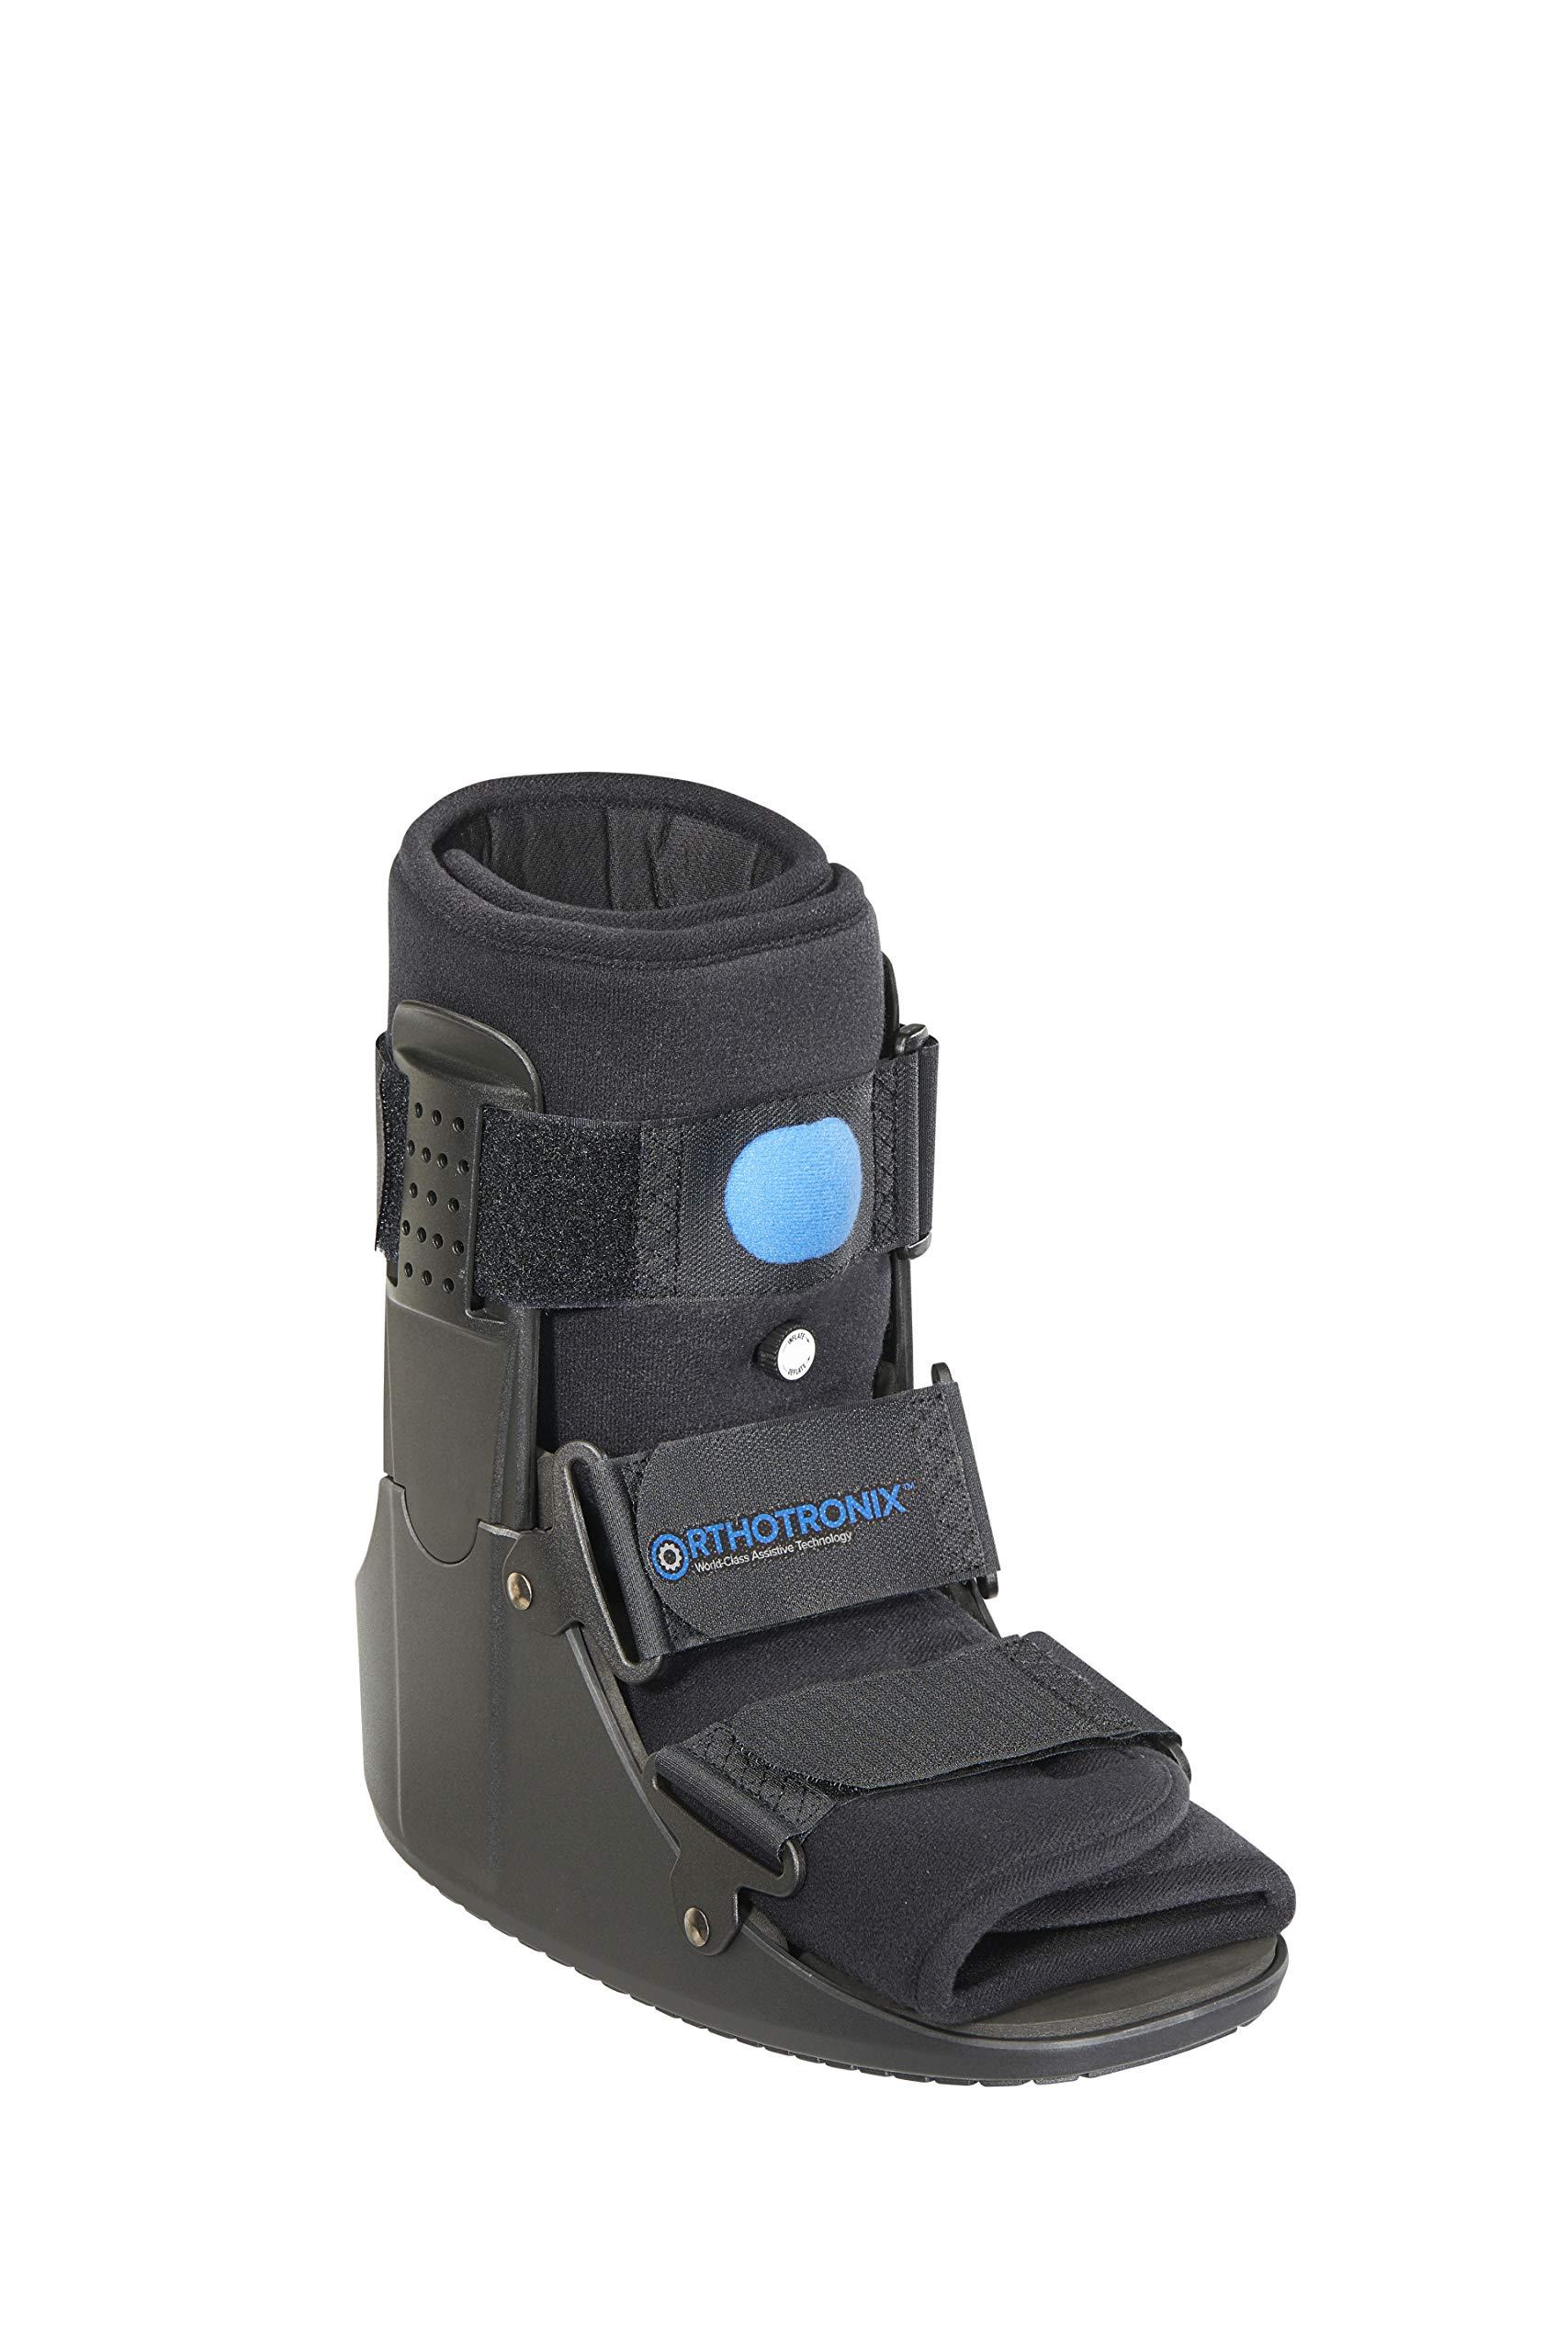 Orthotronix Short Air Cam Walker Boot (Medium) by Orthotronix